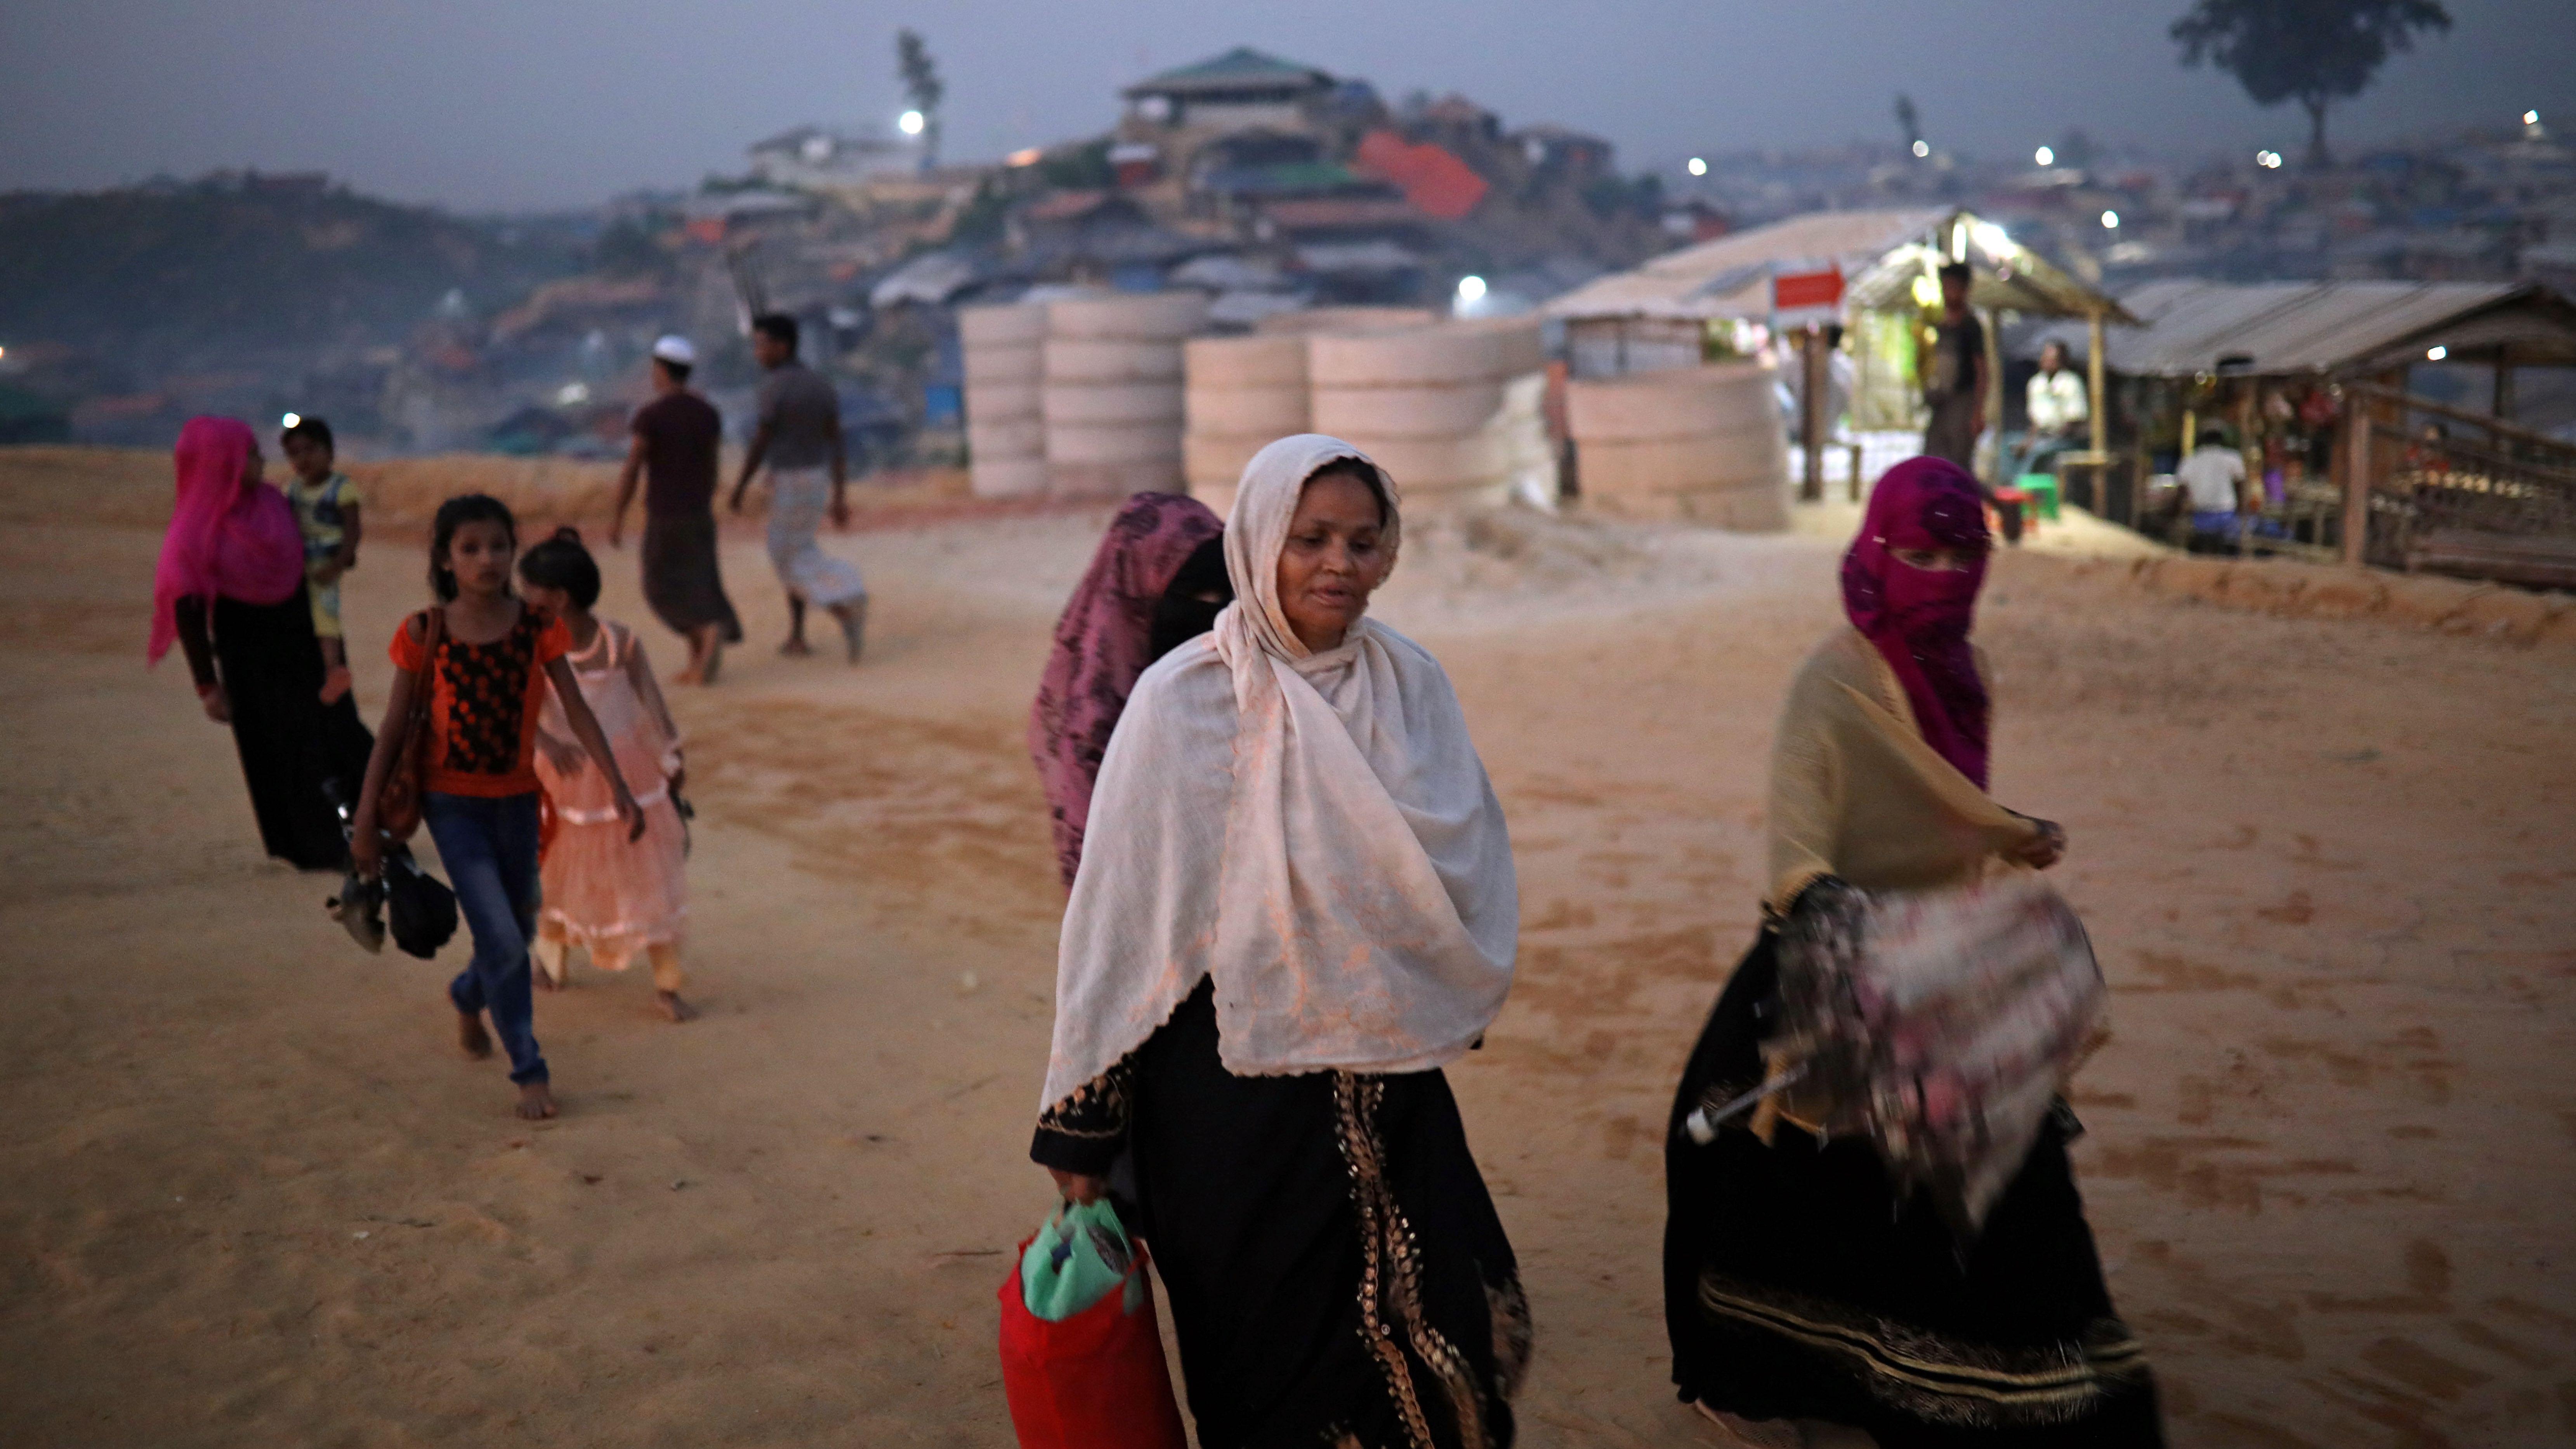 Rohingyarefugees walk along the road in the evening at Balukhali camp in Cox's Bazar, Bangladesh, Nov.16, 2018.